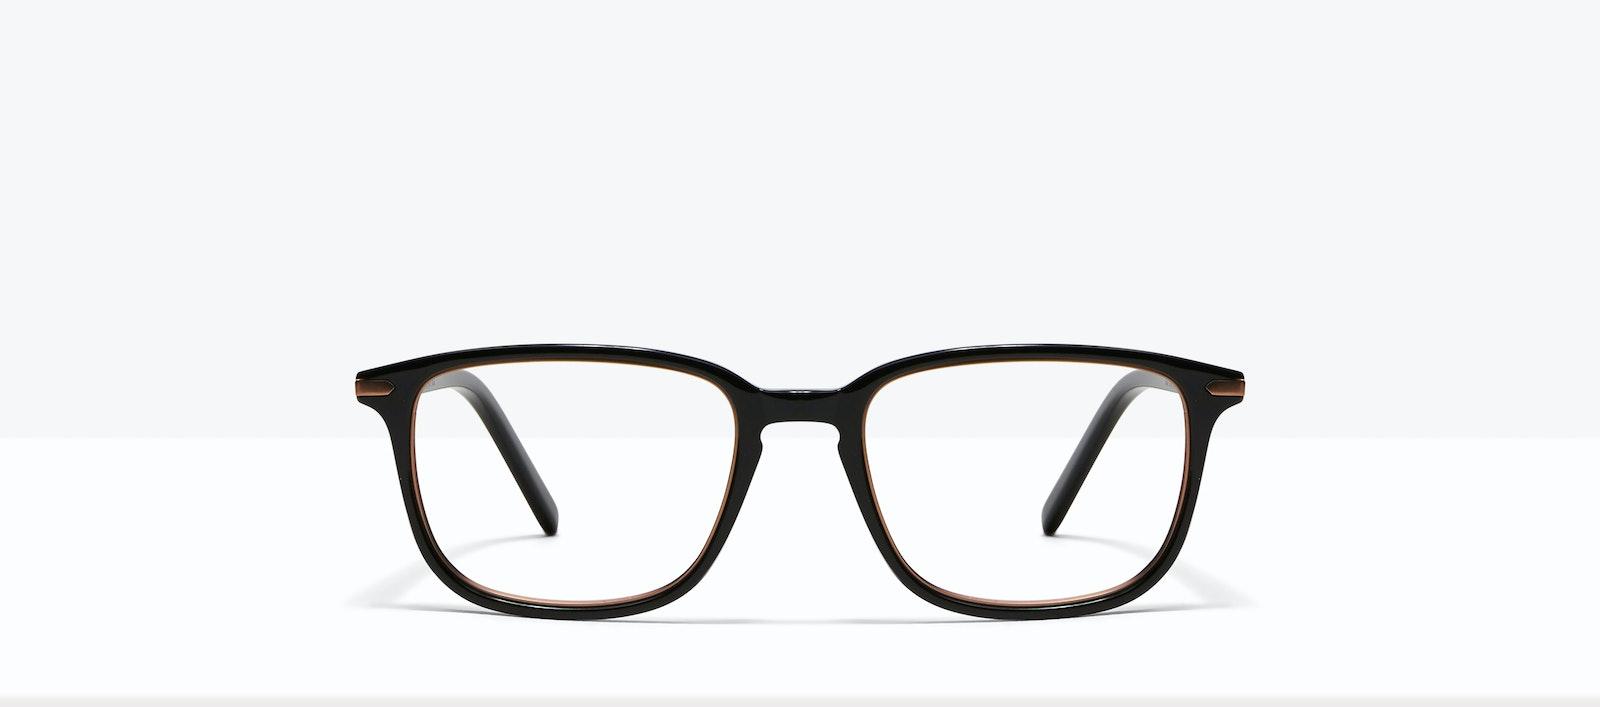 Affordable Fashion Glasses Square Eyeglasses Men Sharp Lux Black Copper Front